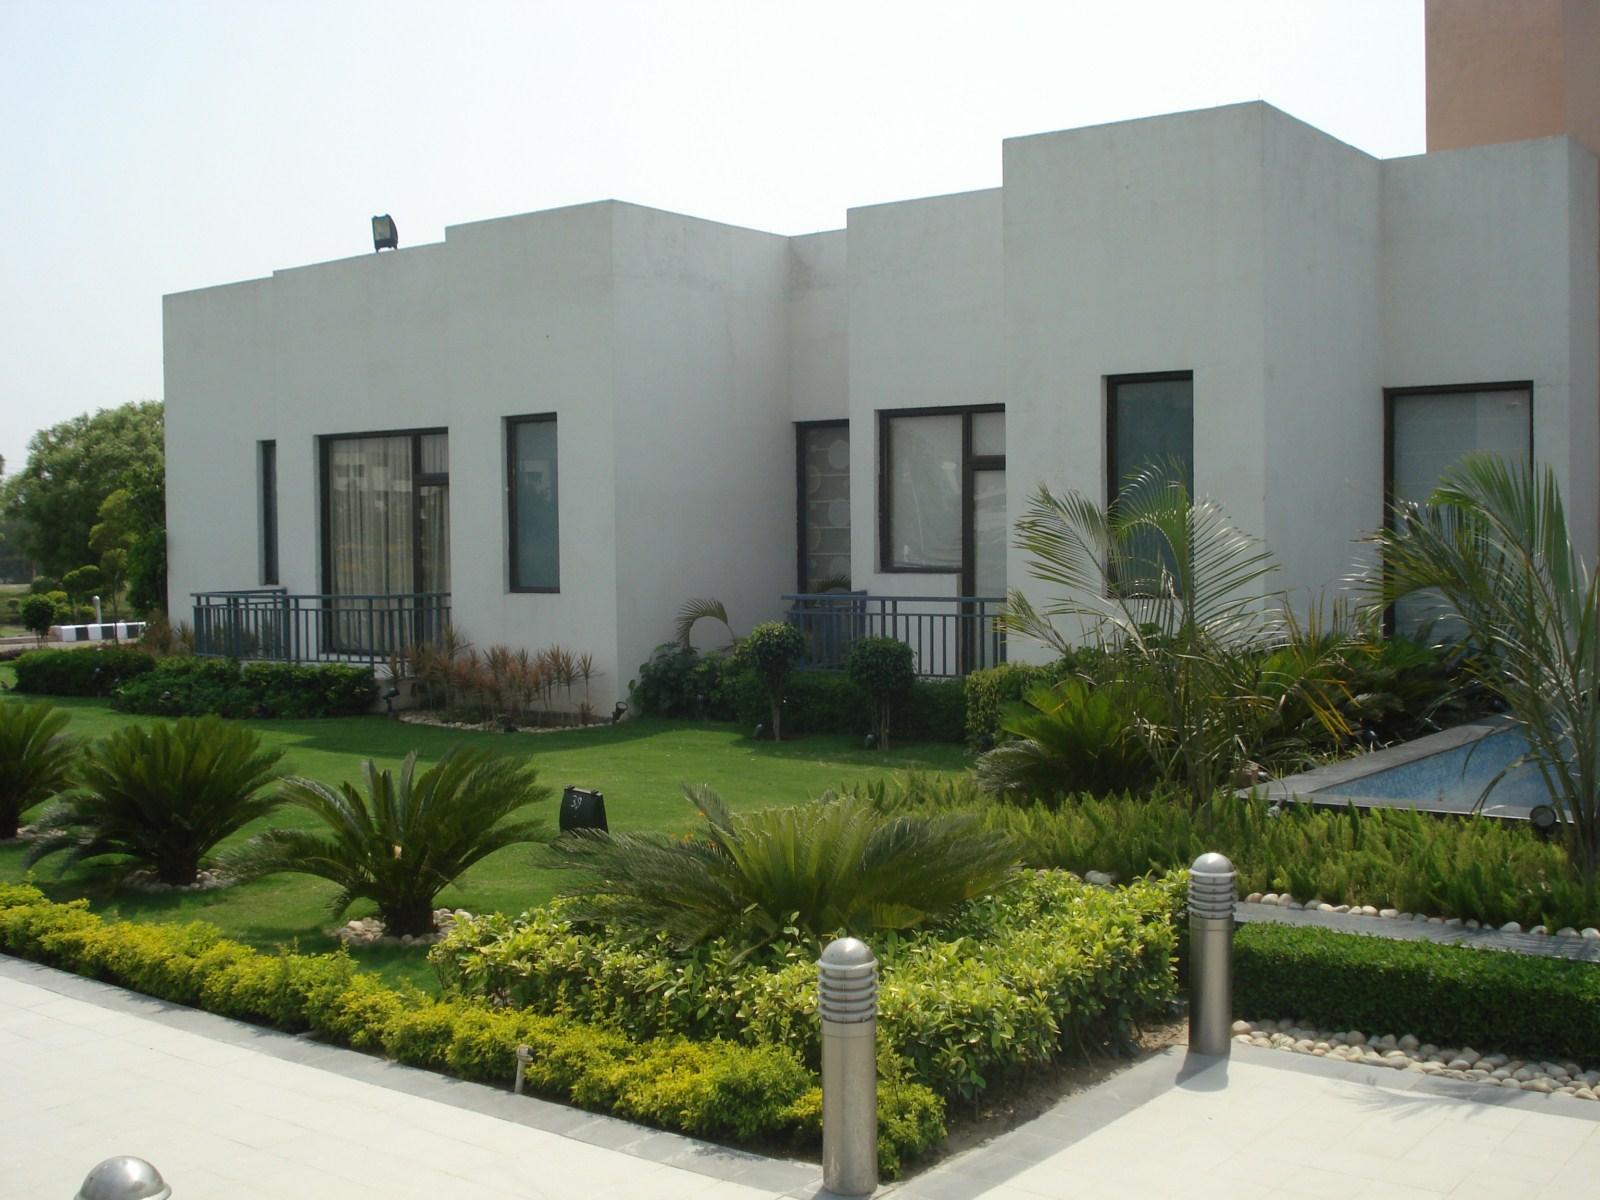 Vardhaman Club House, Sonepat 2